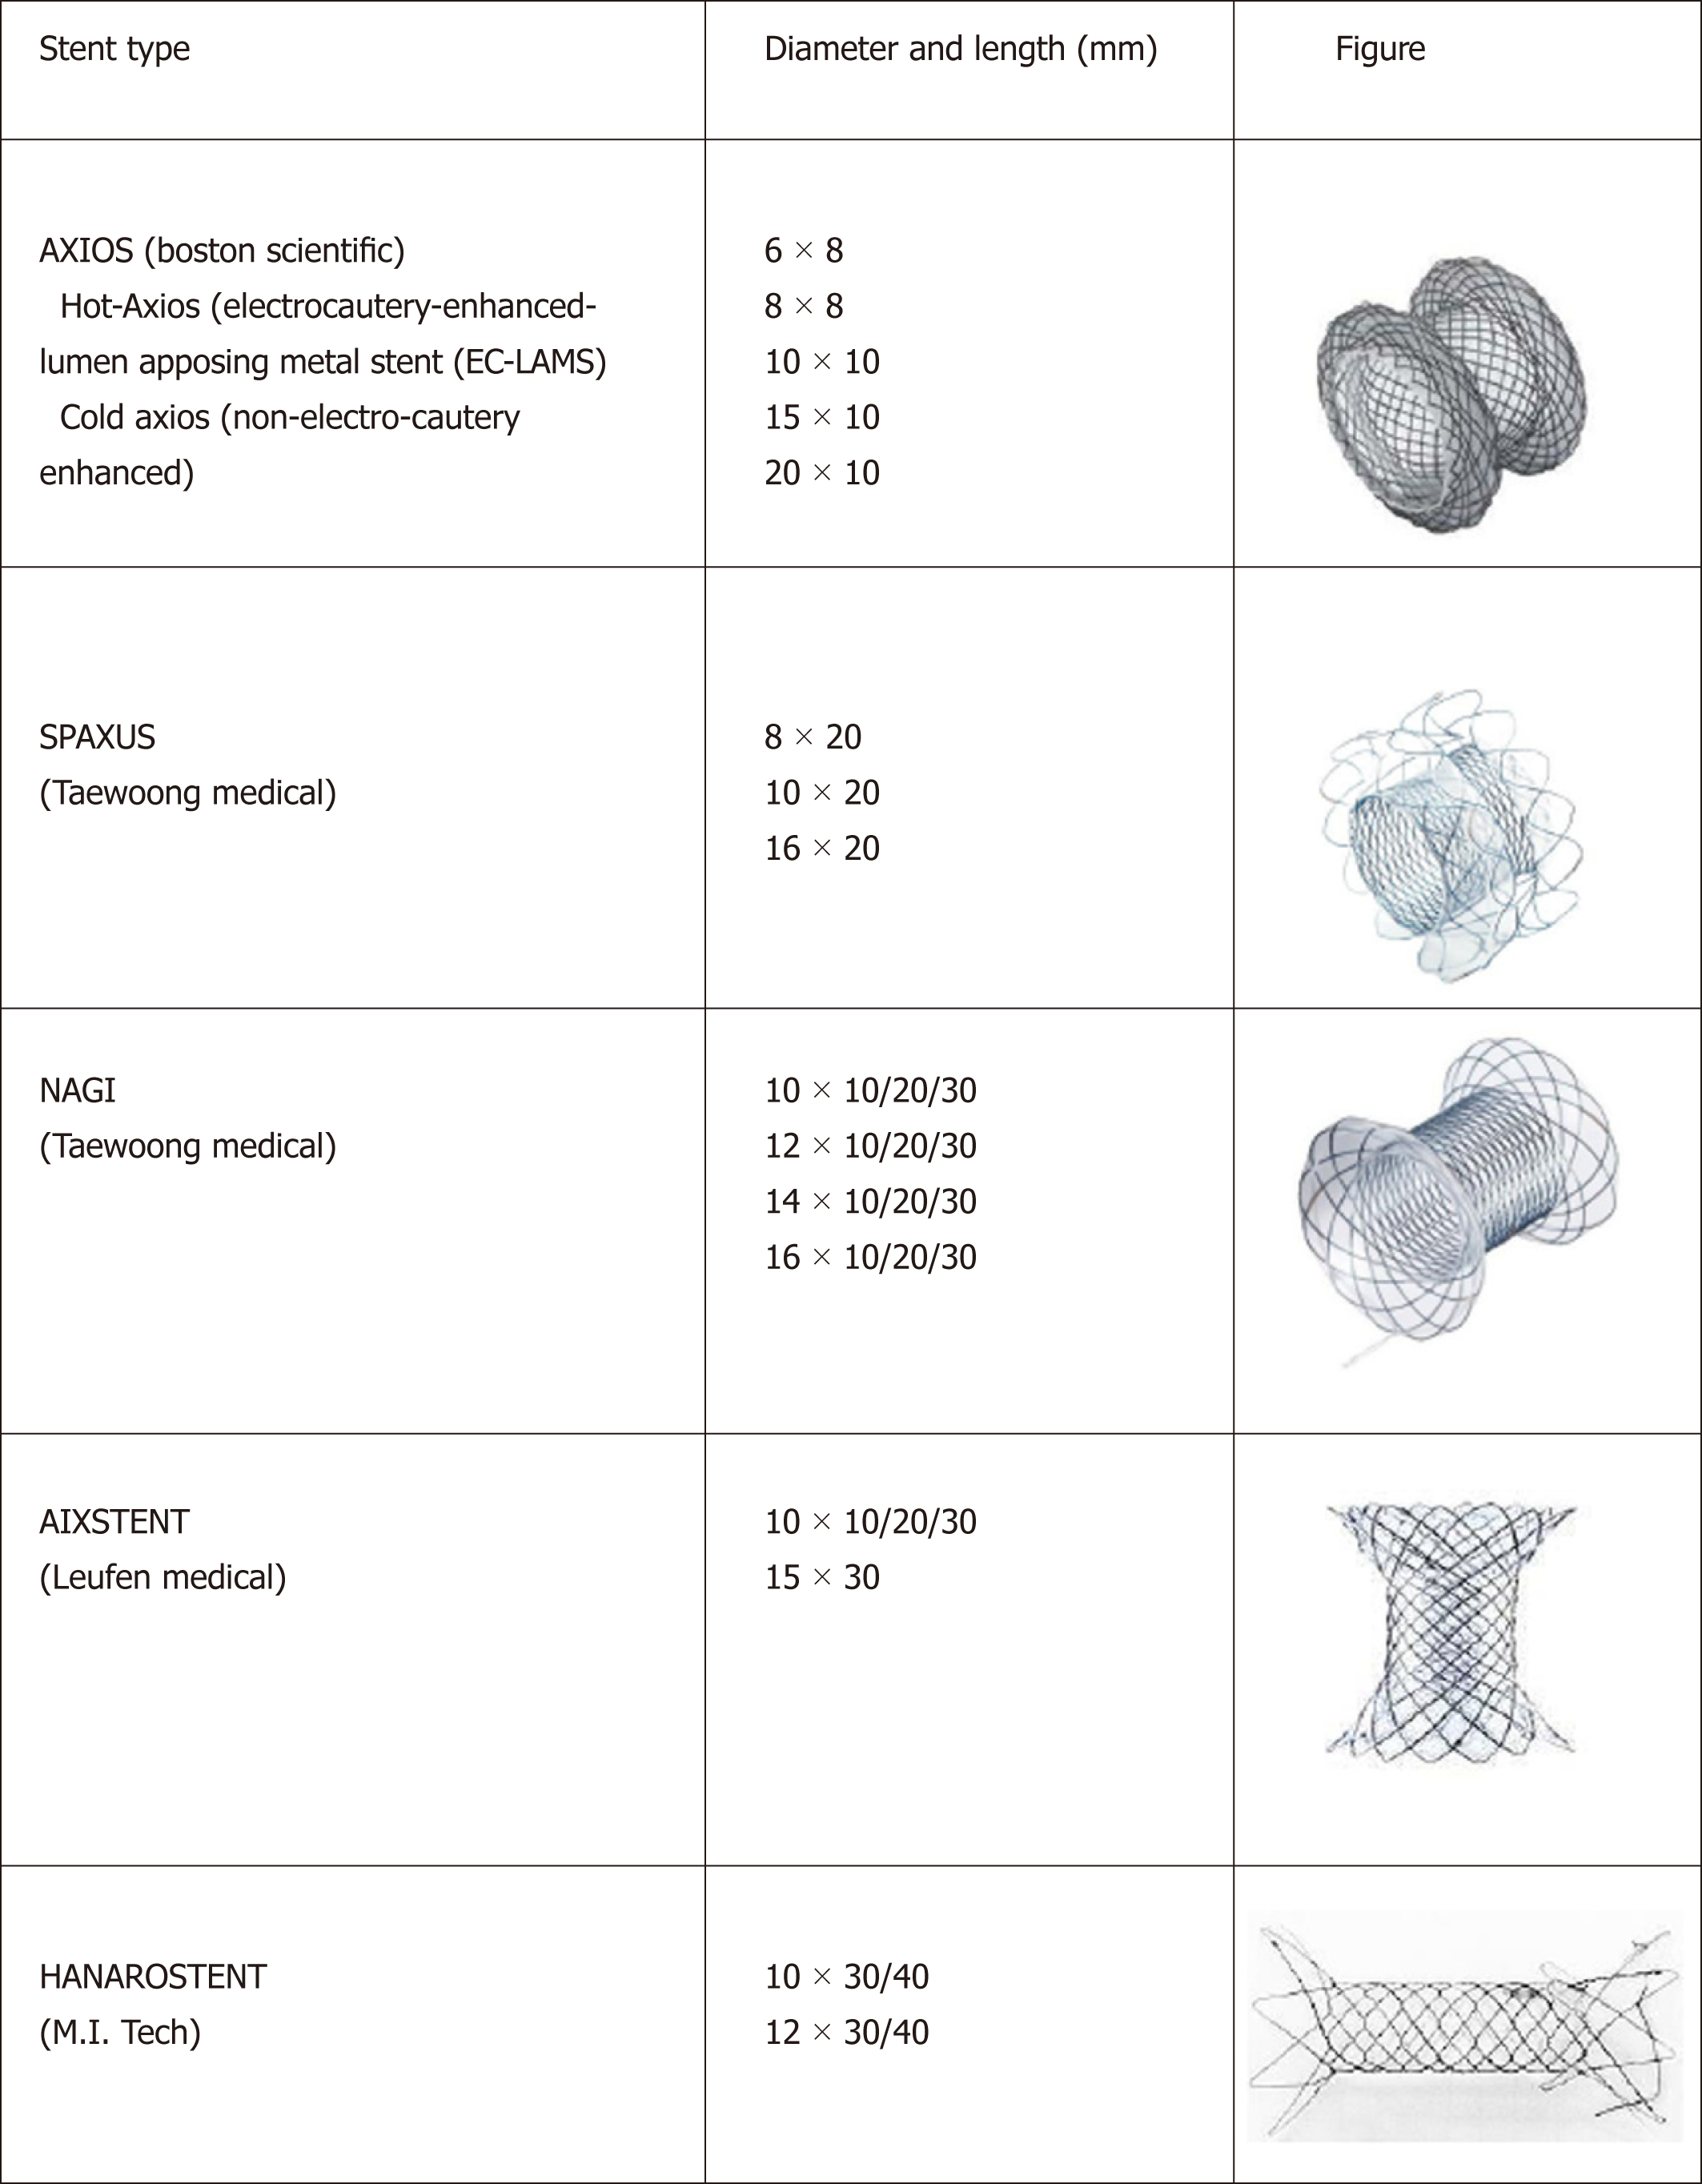 Lumen-apposing metal stents for malignant biliary